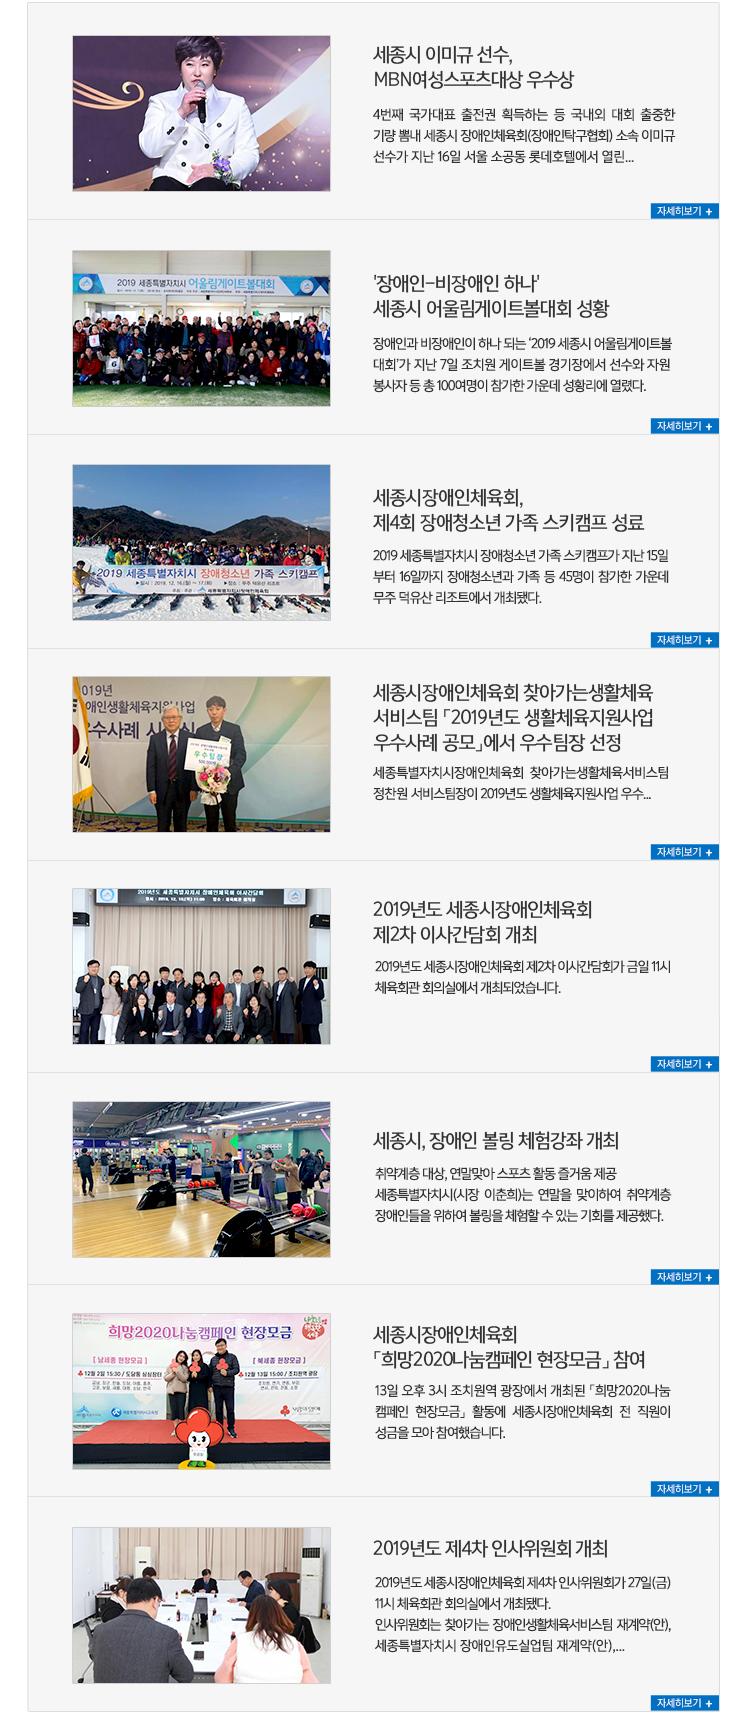 news_02a.jpg